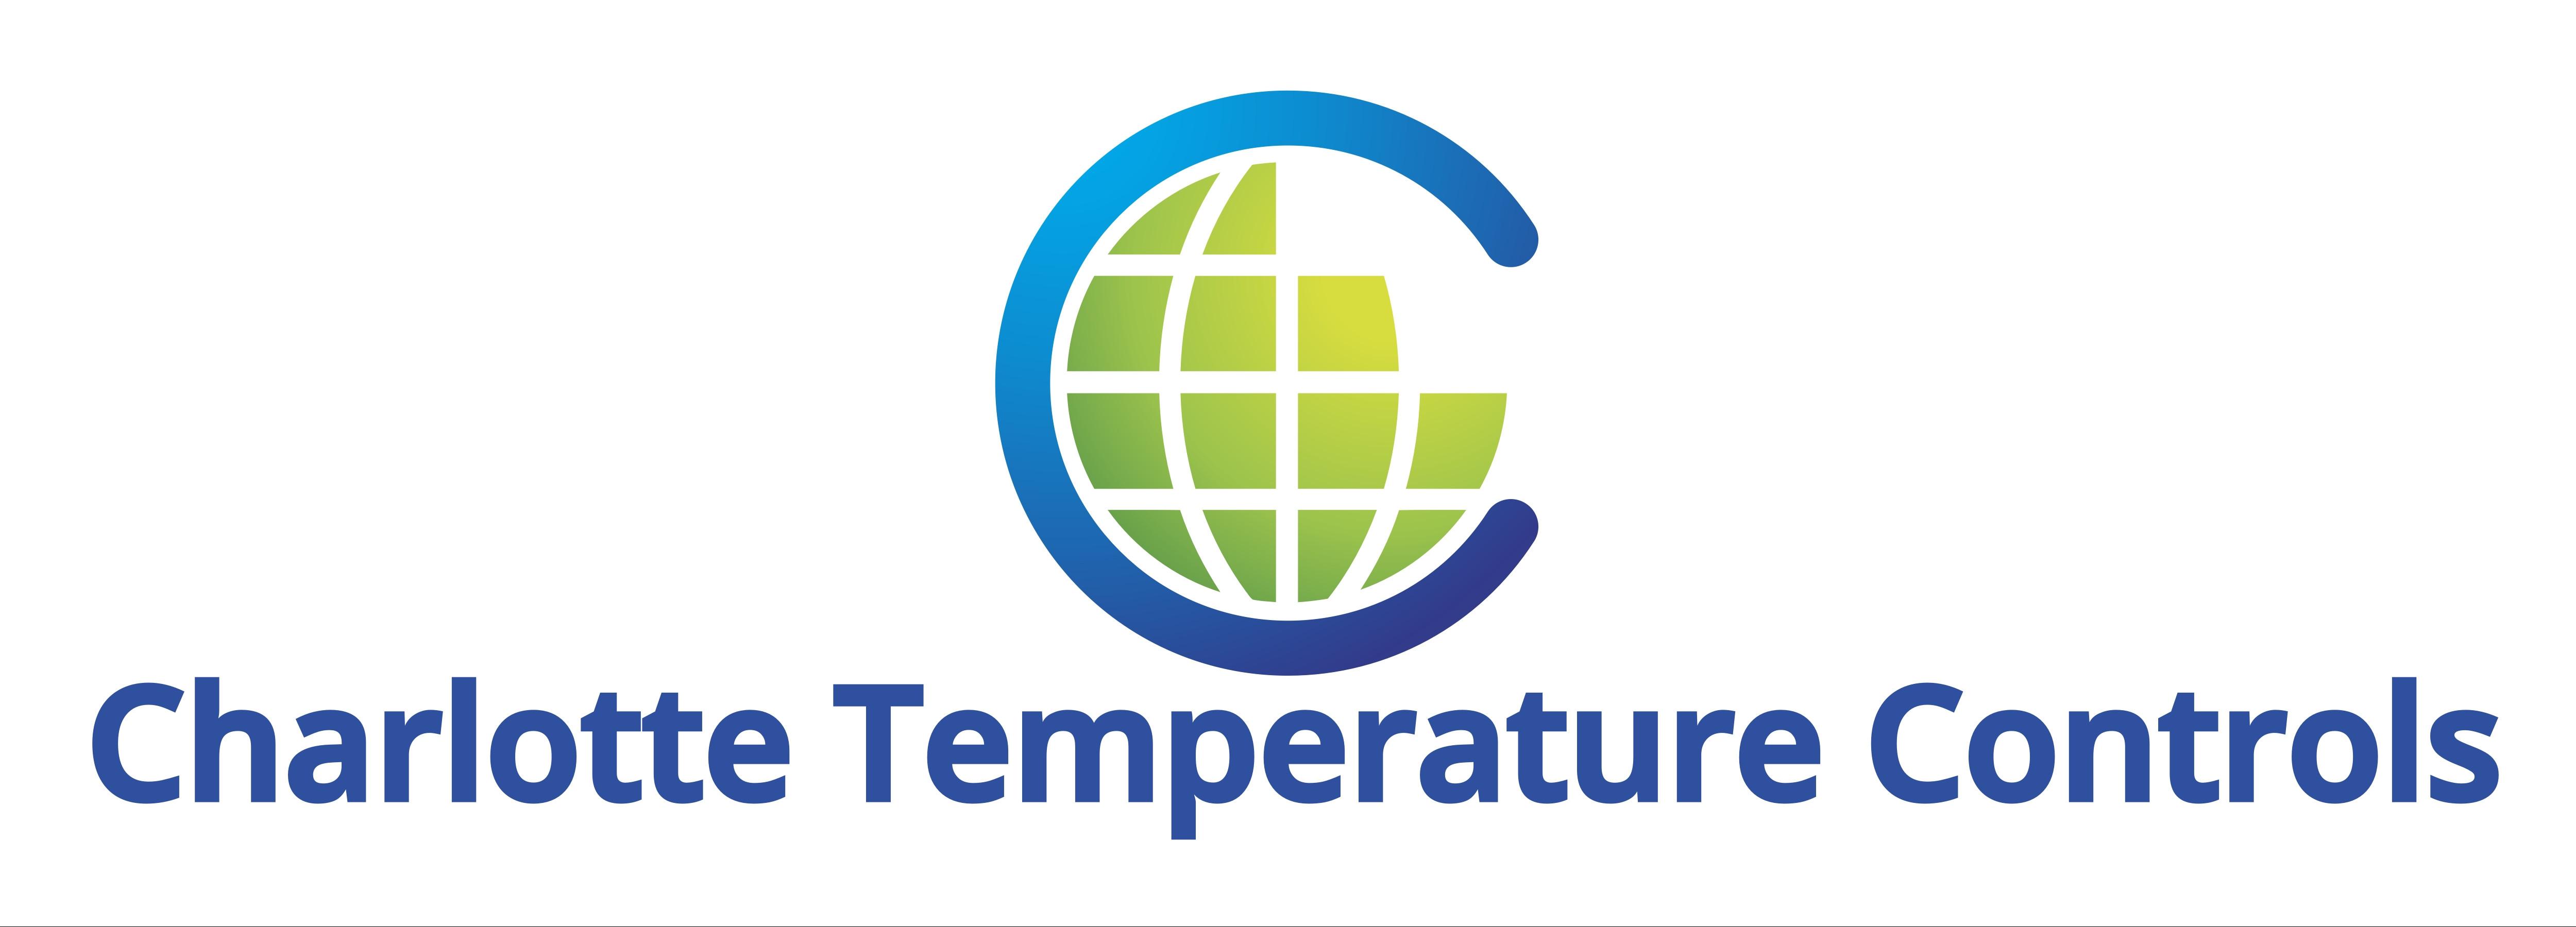 Charlotte Temperature Controls, Inc.